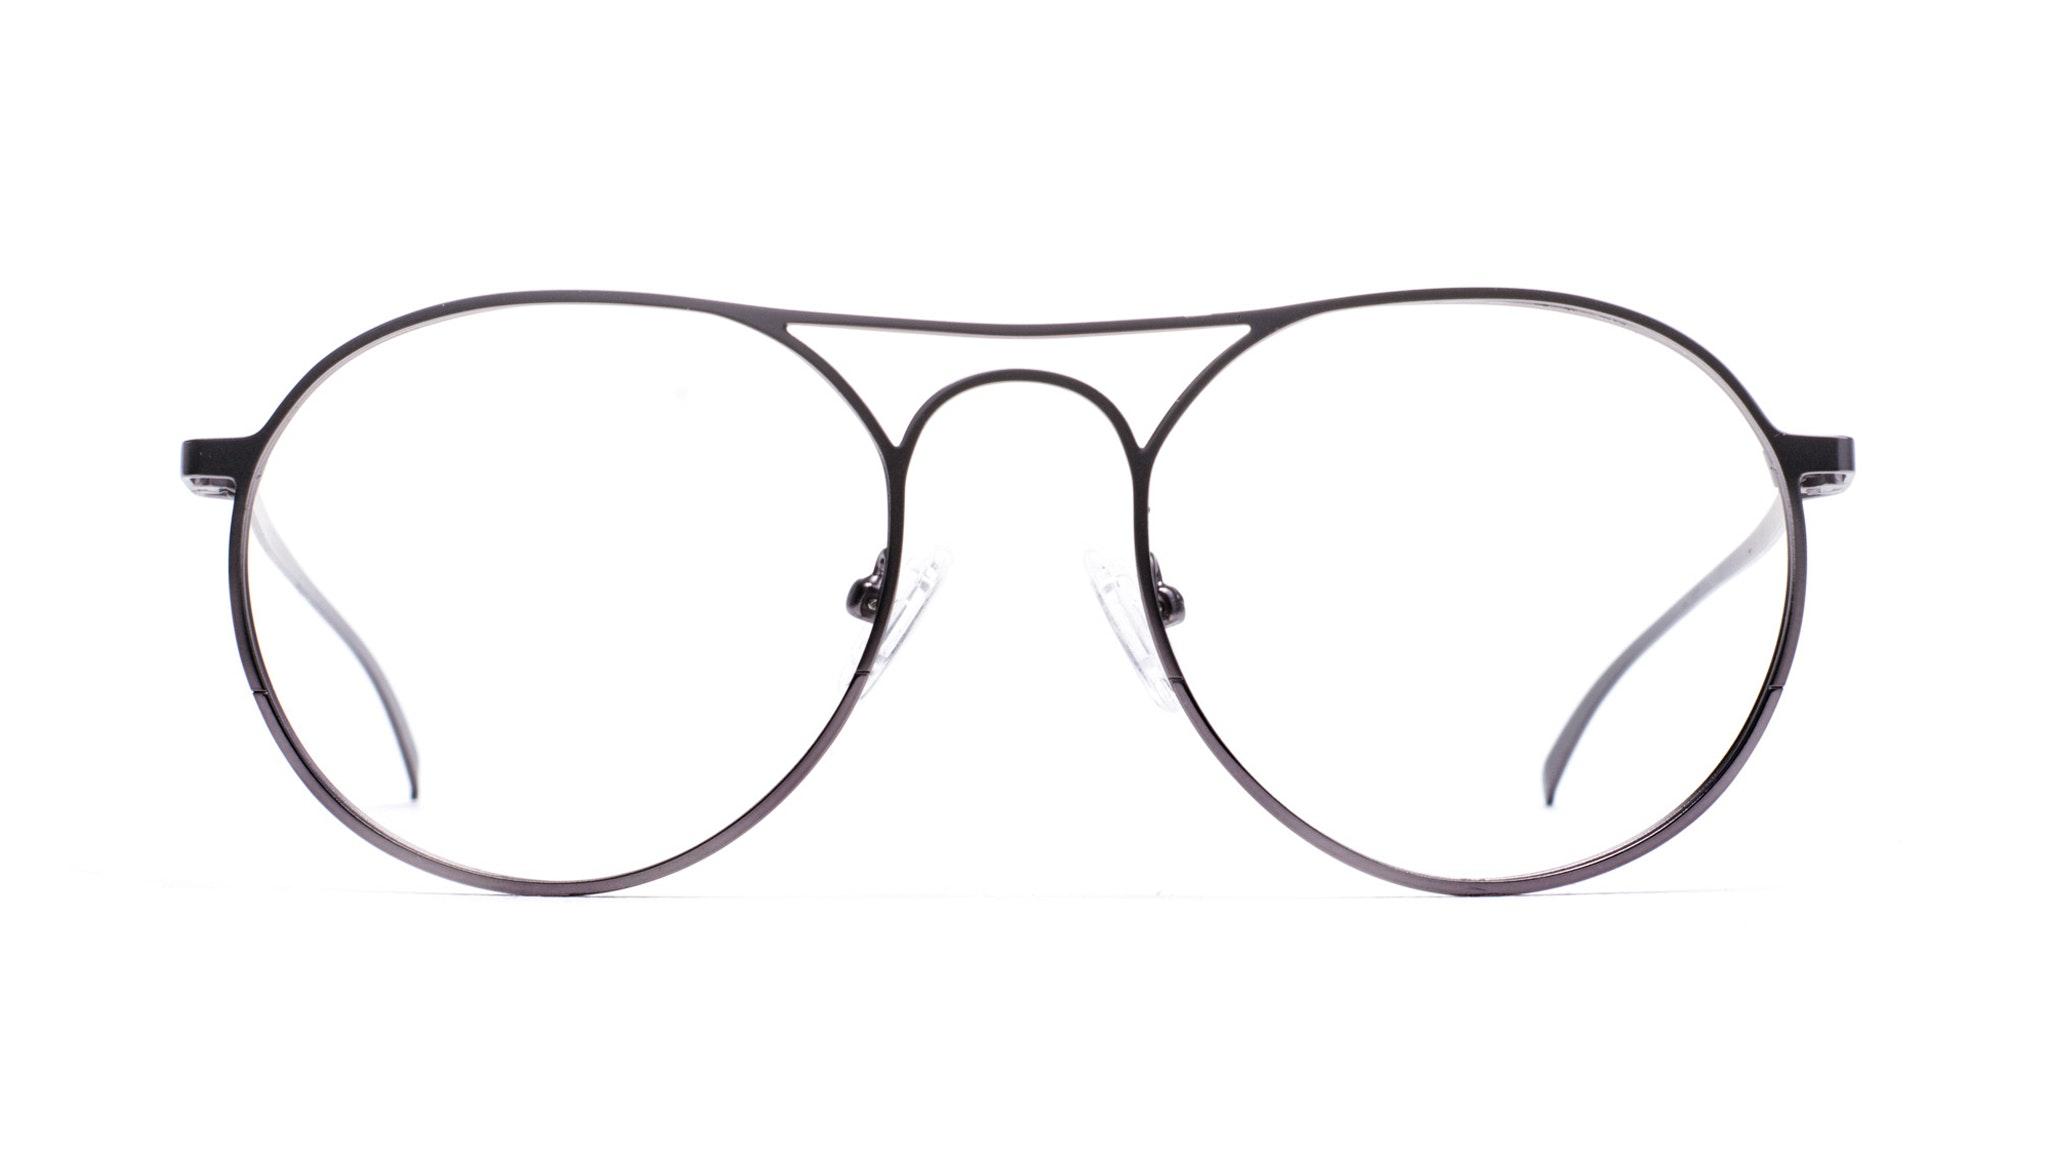 Affordable Fashion Glasses Aviator Round Eyeglasses Men Contour Black